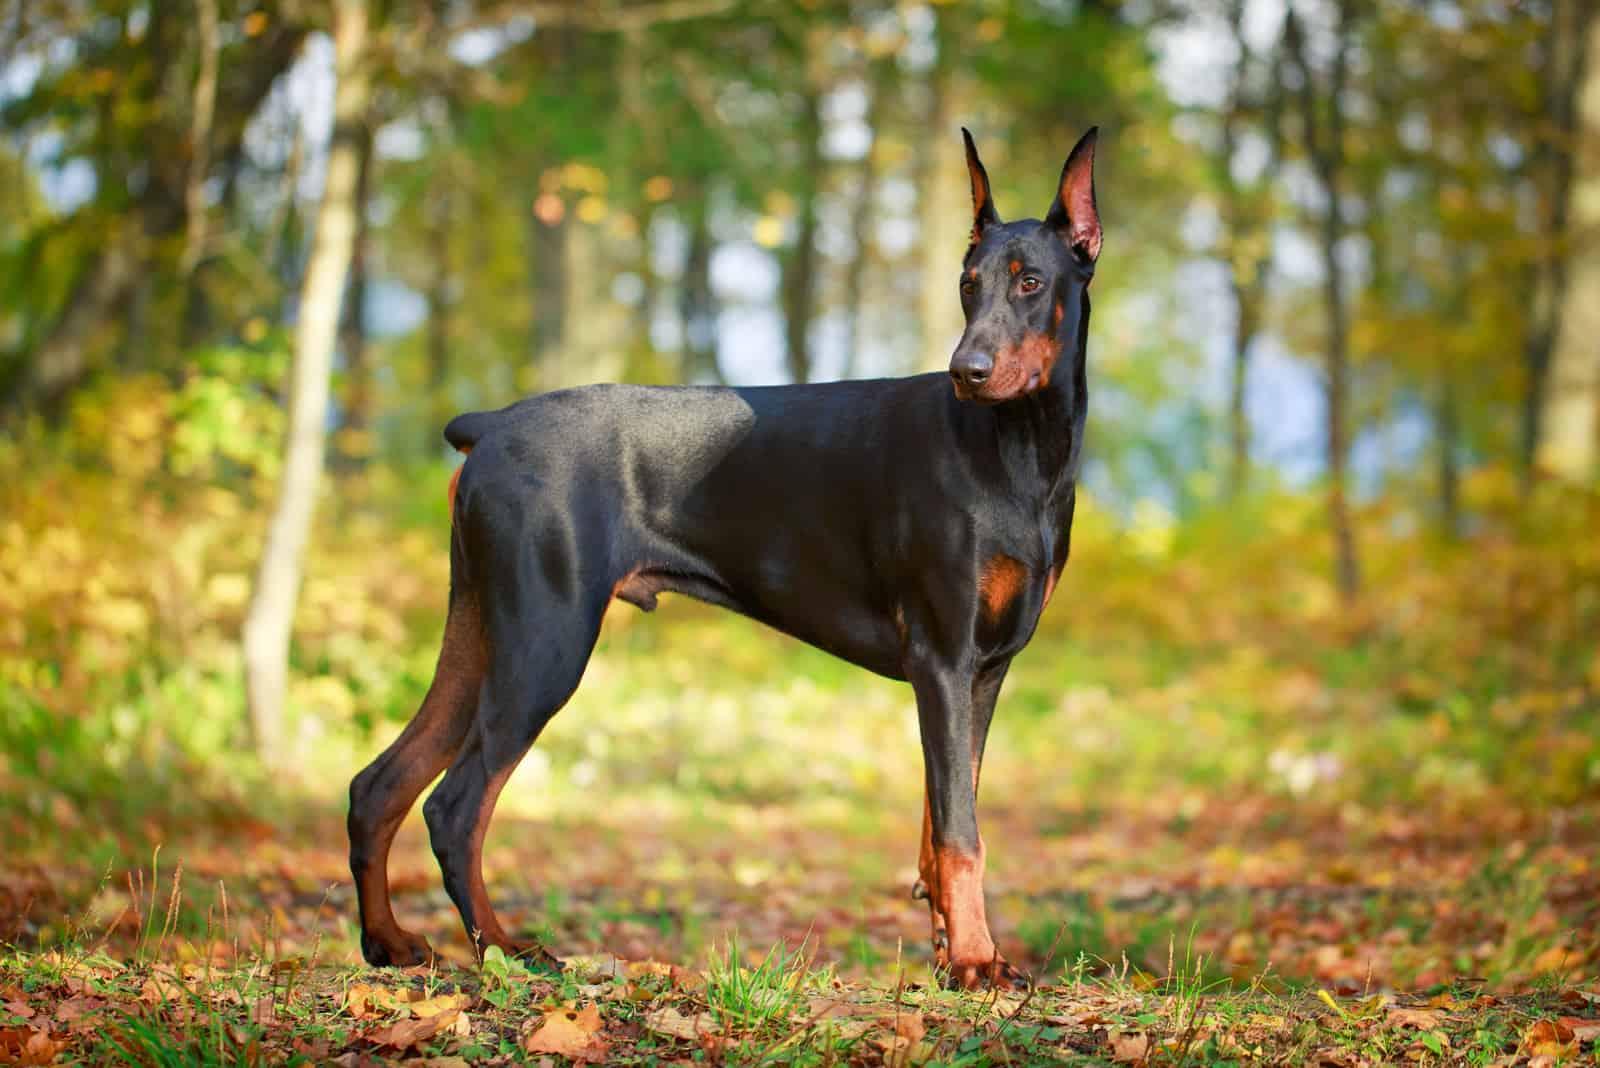 doberman dog standing outdoors